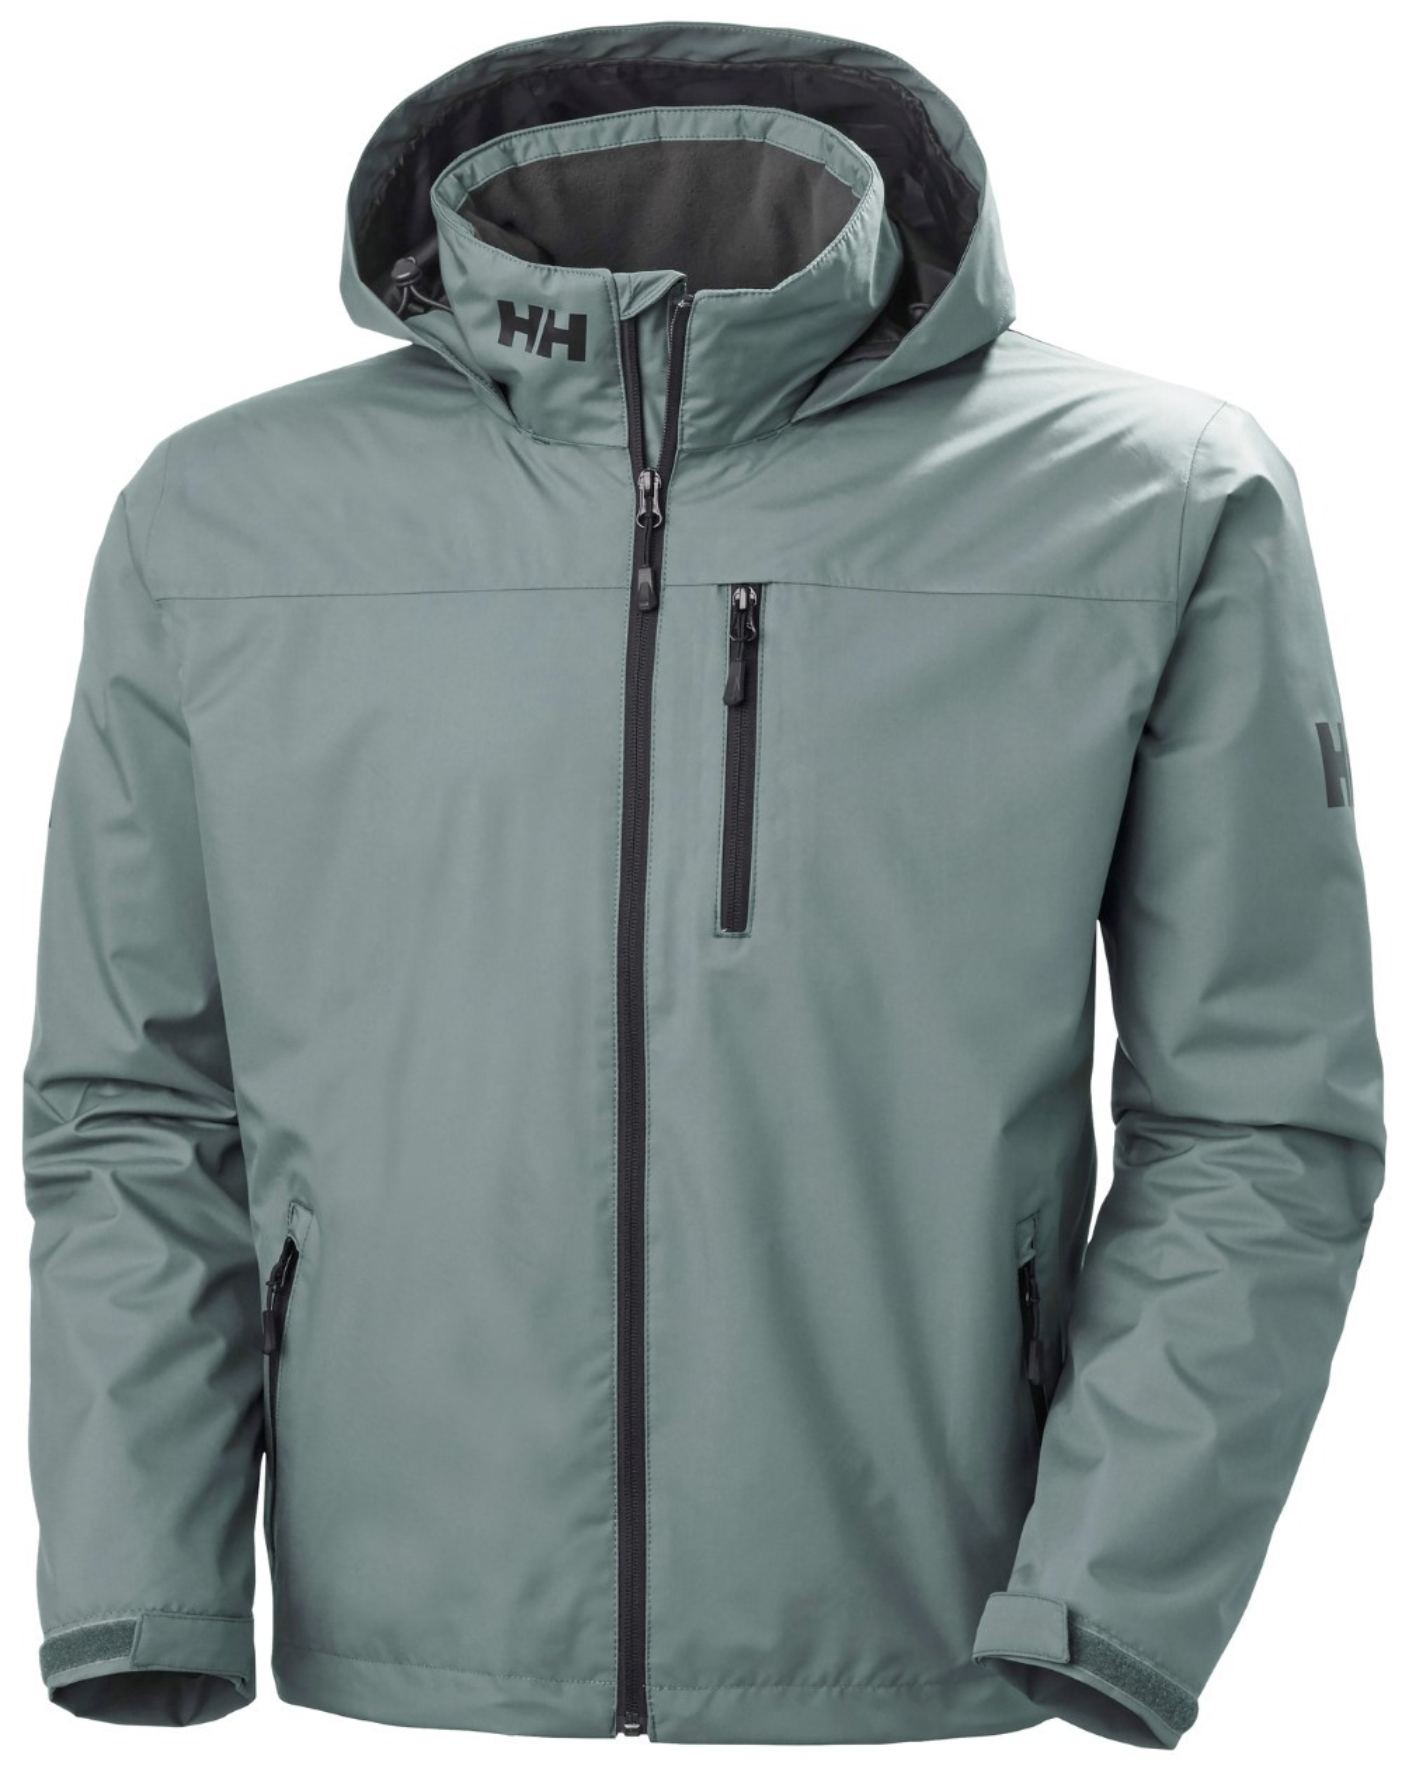 Helly-Hansen Mens Crew Hooded Midlayer Fleece Lined Waterproof Raincoat Jacket